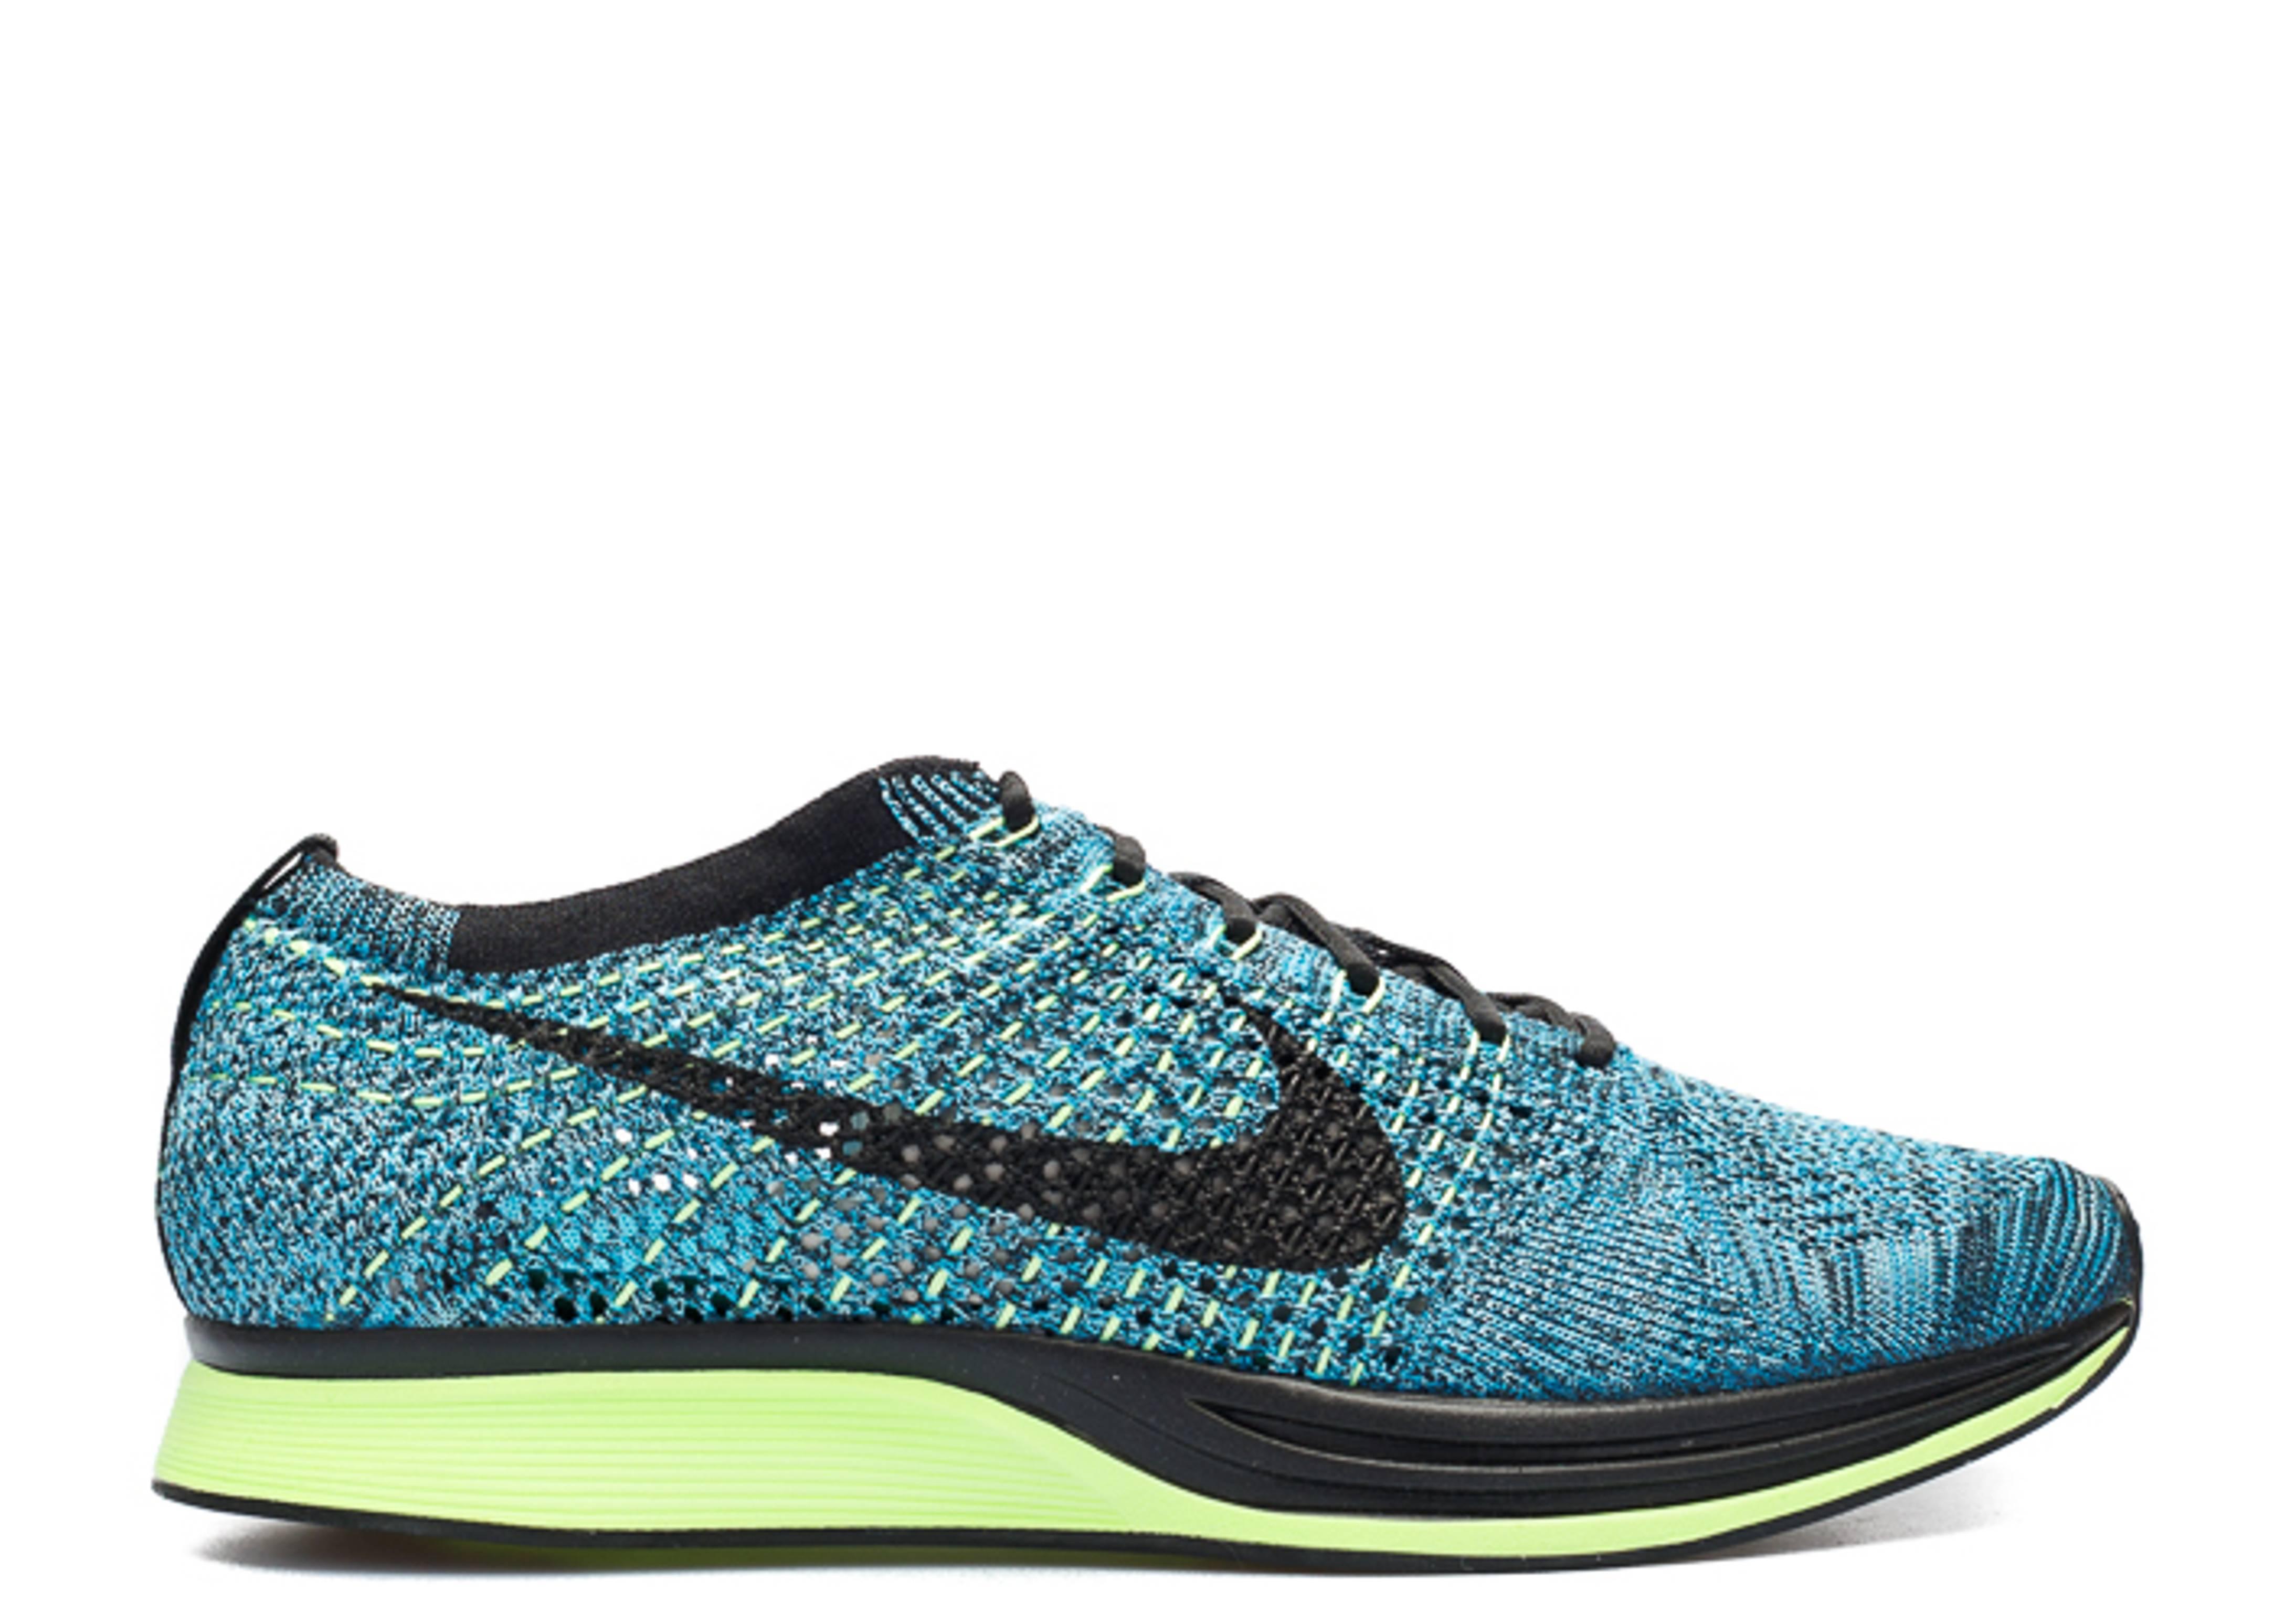 99a19c66f51e Flyknit Racer - Nike - 526628 401 - blue lagoon black plrzd blue ...